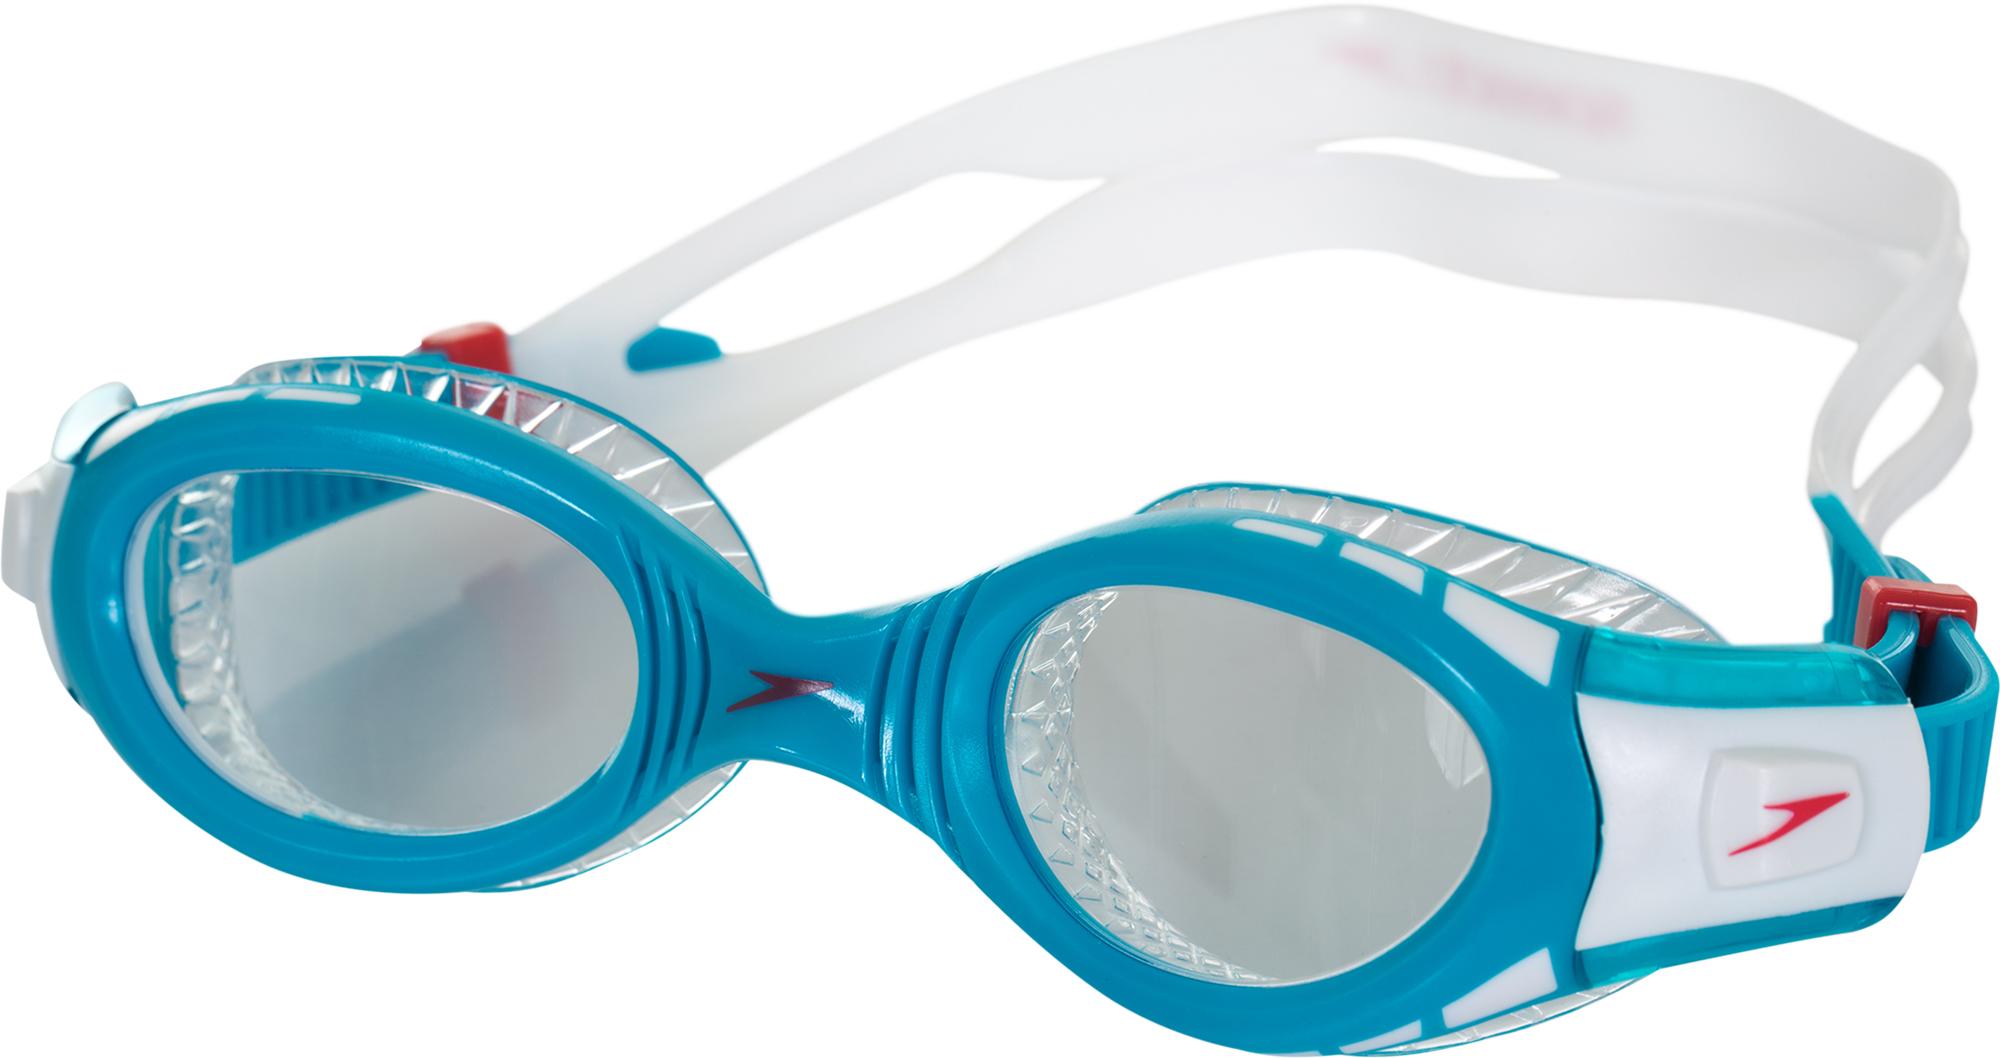 Speedo Очки для плавания детские Speedo Futura Biofuse, размер Без размера очки для плавания speedo mariner mirror junior цвет розовый прозрачный